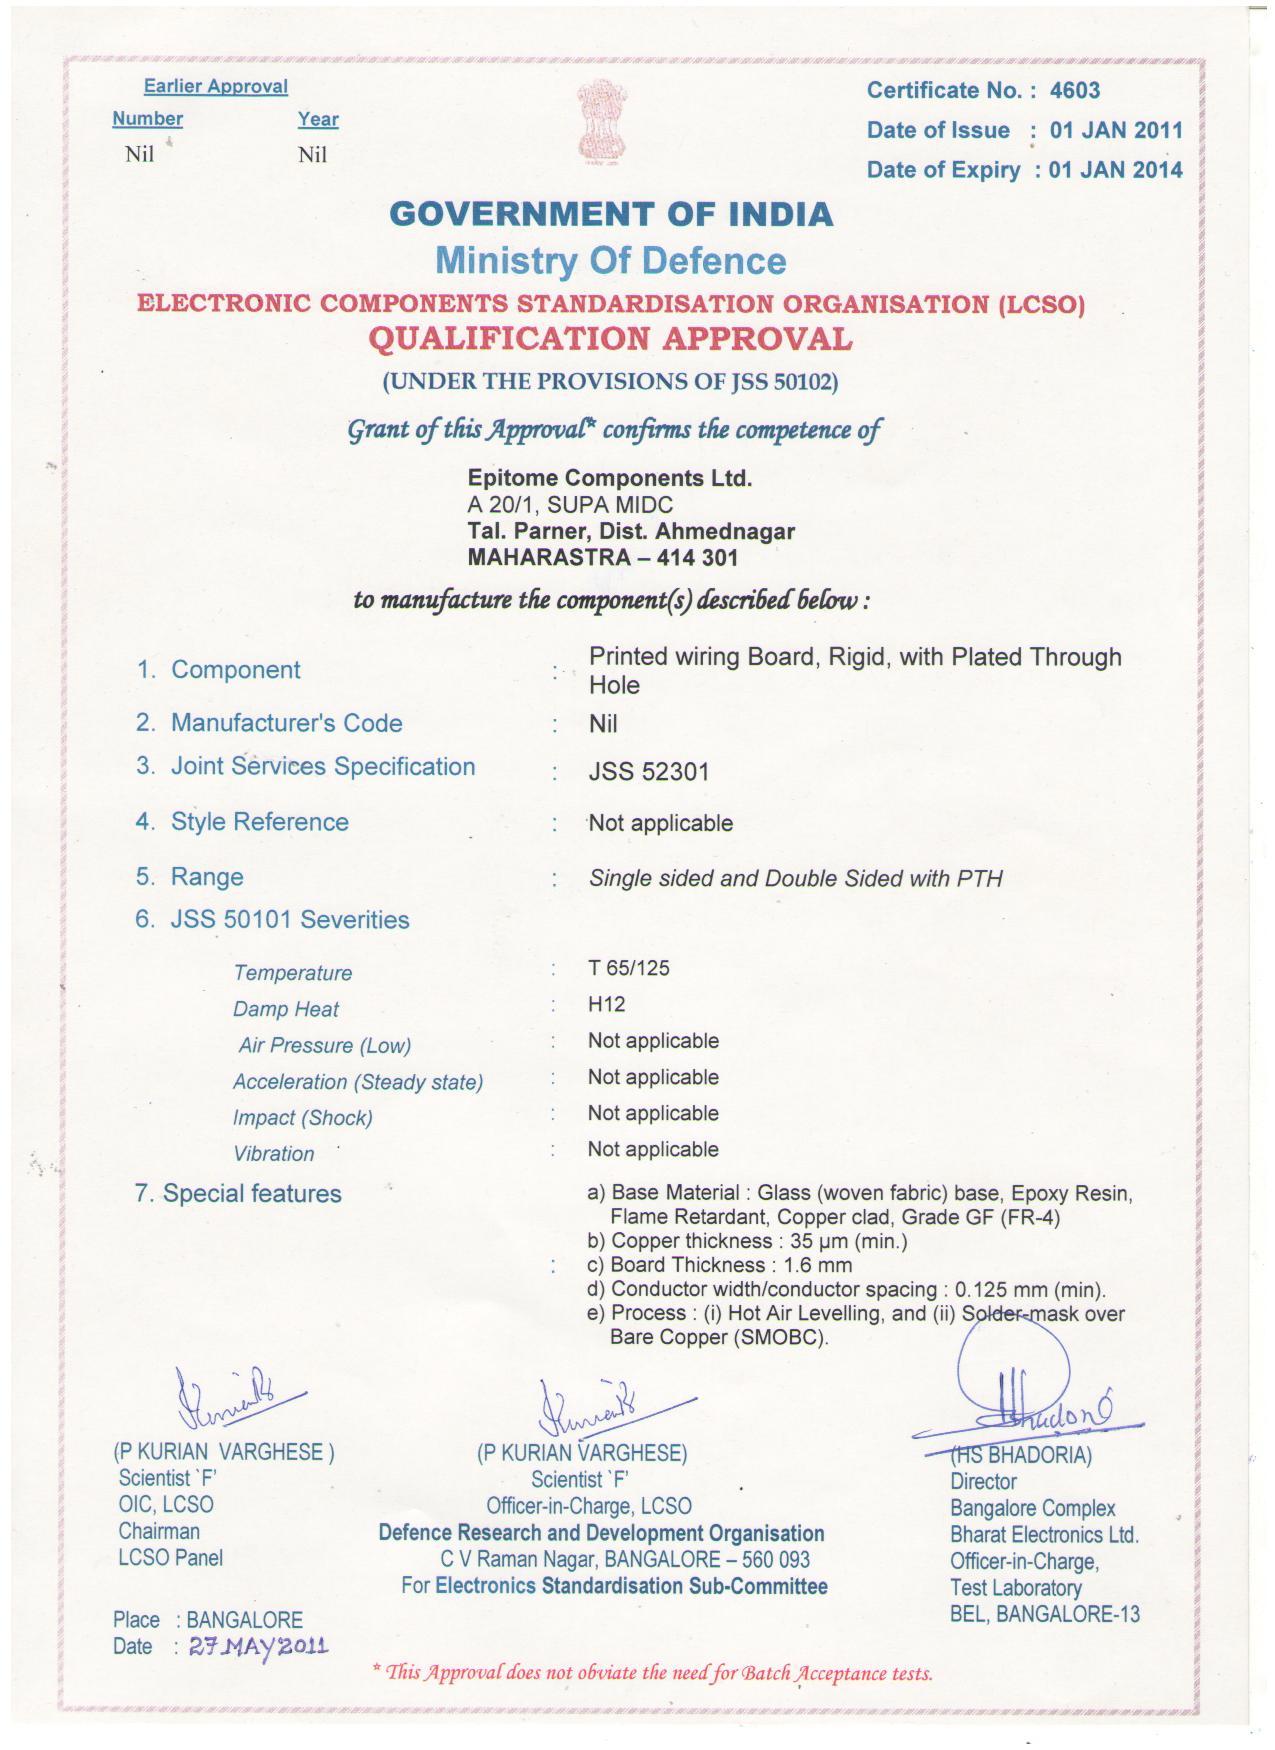 Epitome Components Ltd